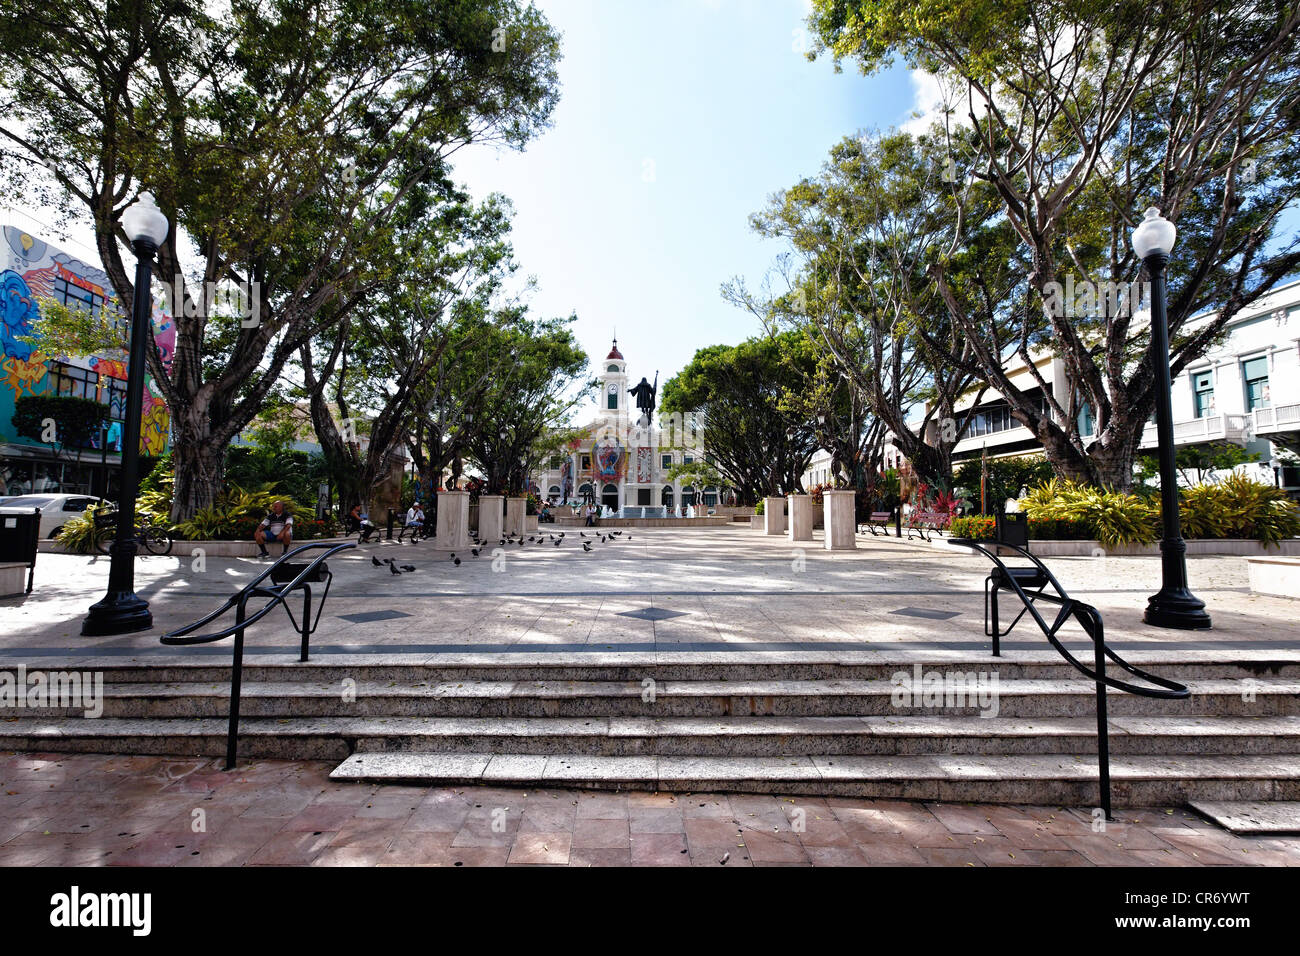 View of Columbus Square, Mayaguez, Puerto Rico - Stock Image